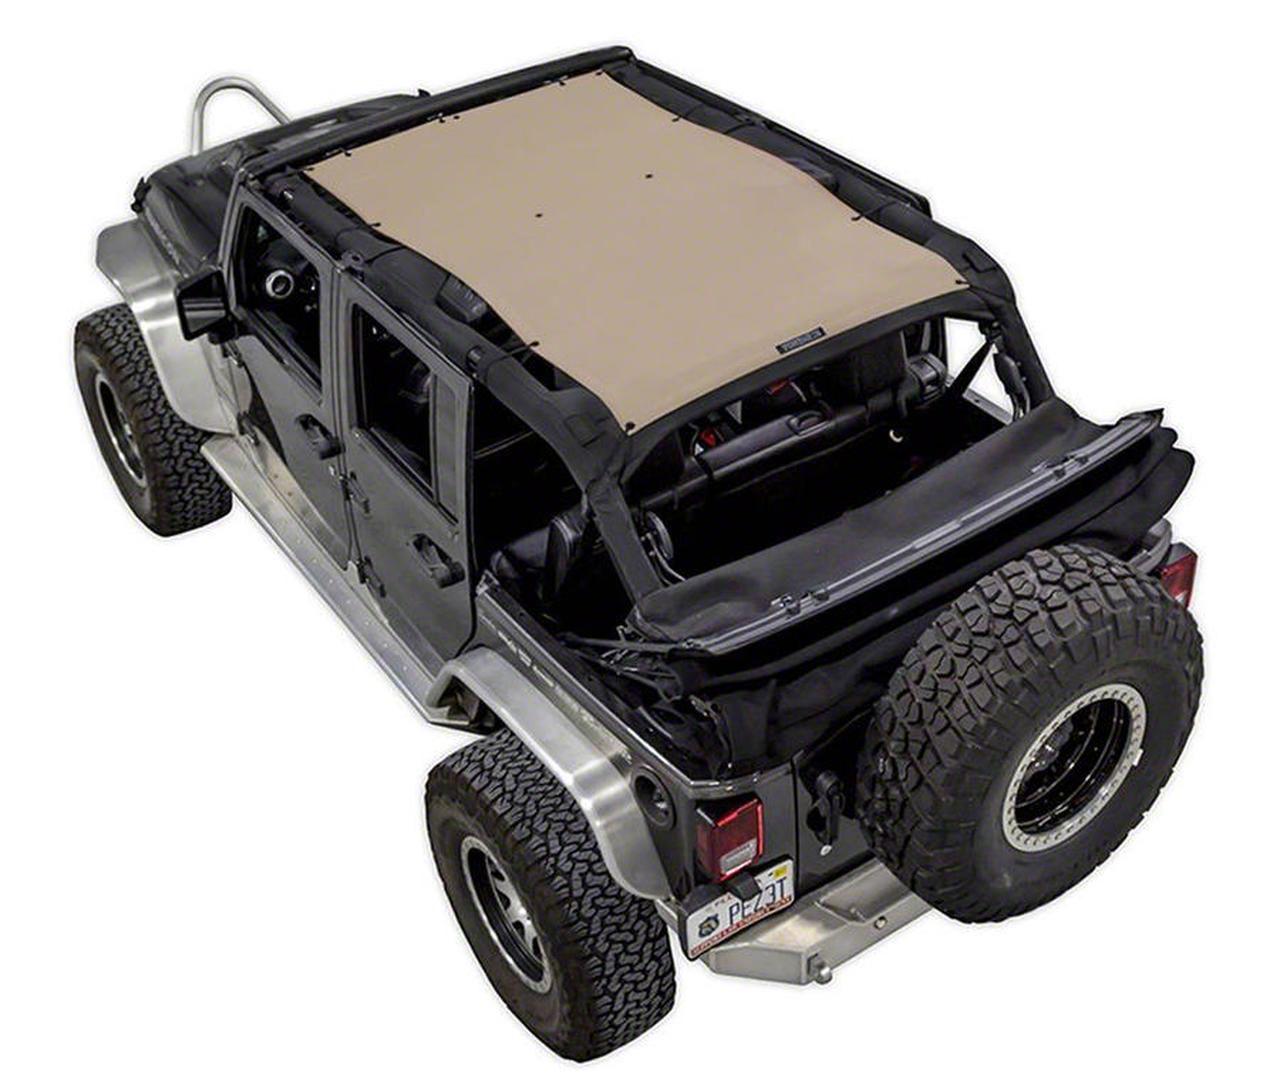 SpiderWeb Shade Trail Mesh ShadeTop - Tan (07-18 Jeep Wrangler JK 4 Door)